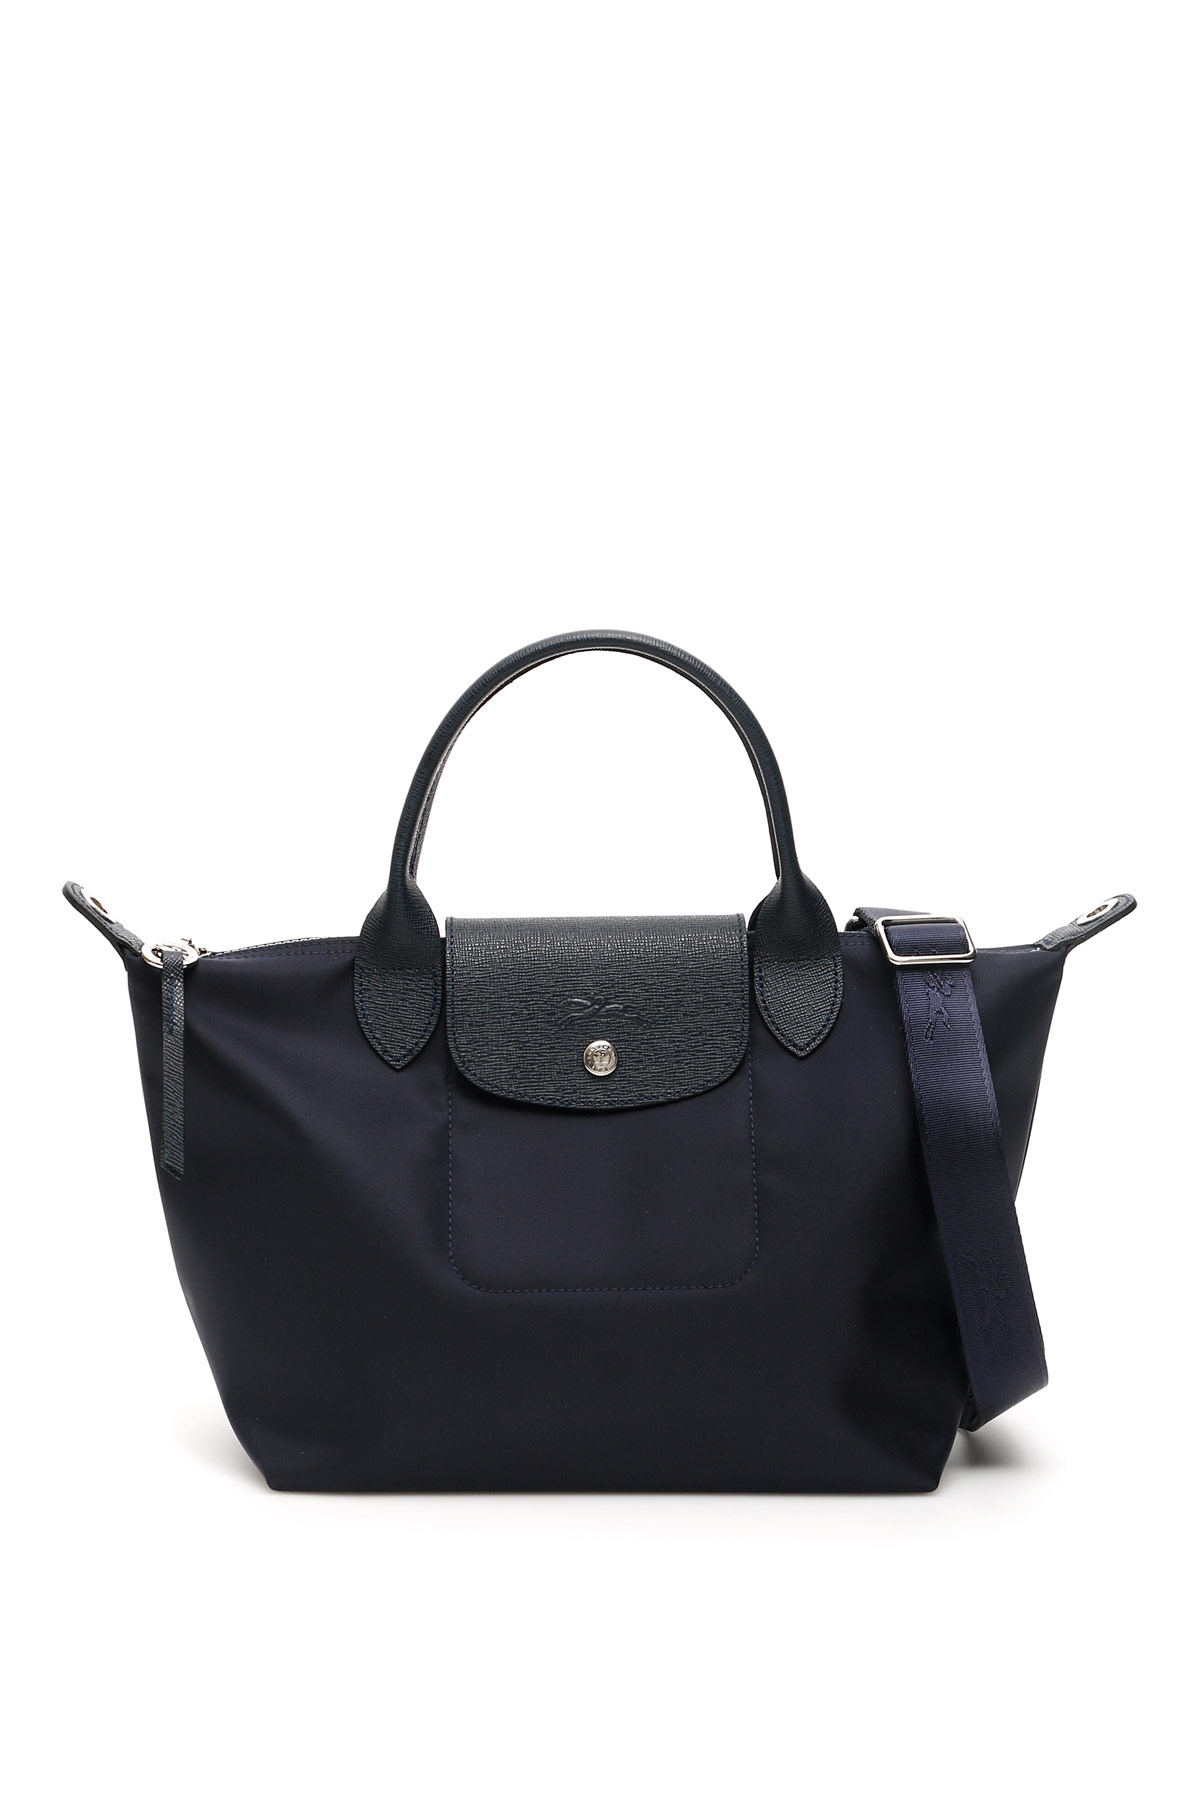 Longchamp shopping le pliage néo small